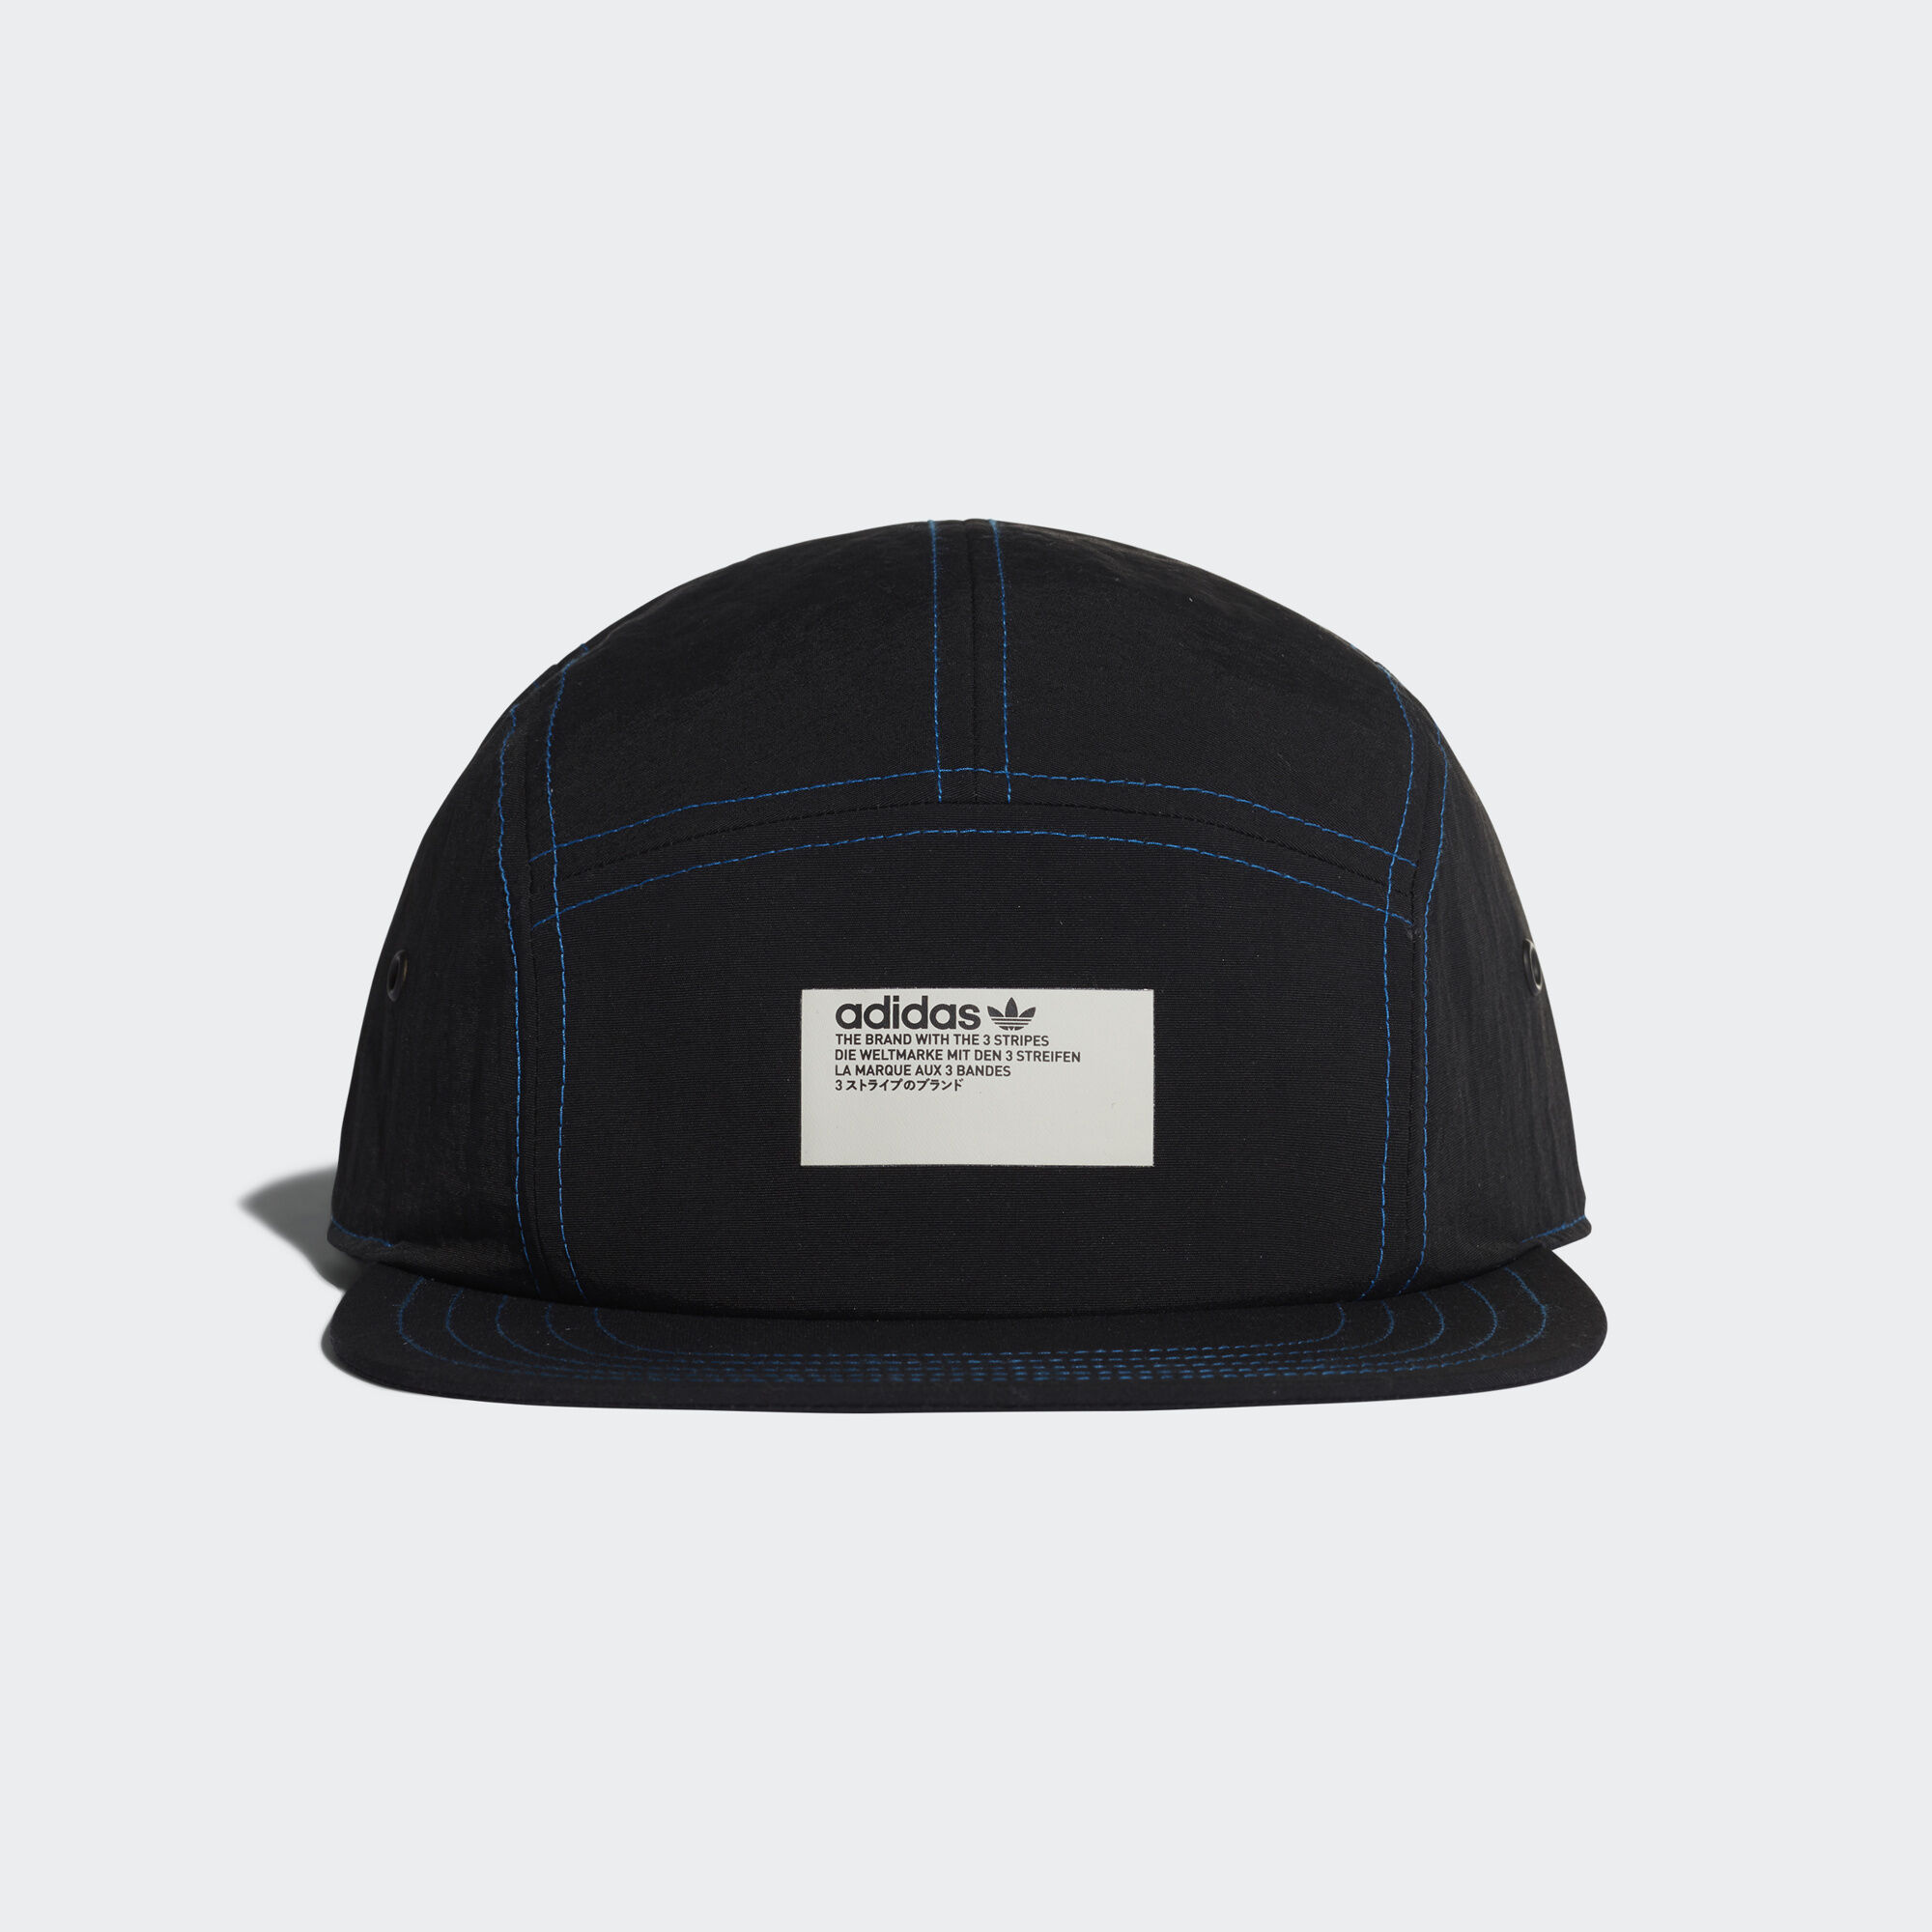 adidas - adidas NMD 5-Panel Cap Black   Lush Blue DH4418 6a61b5ae040